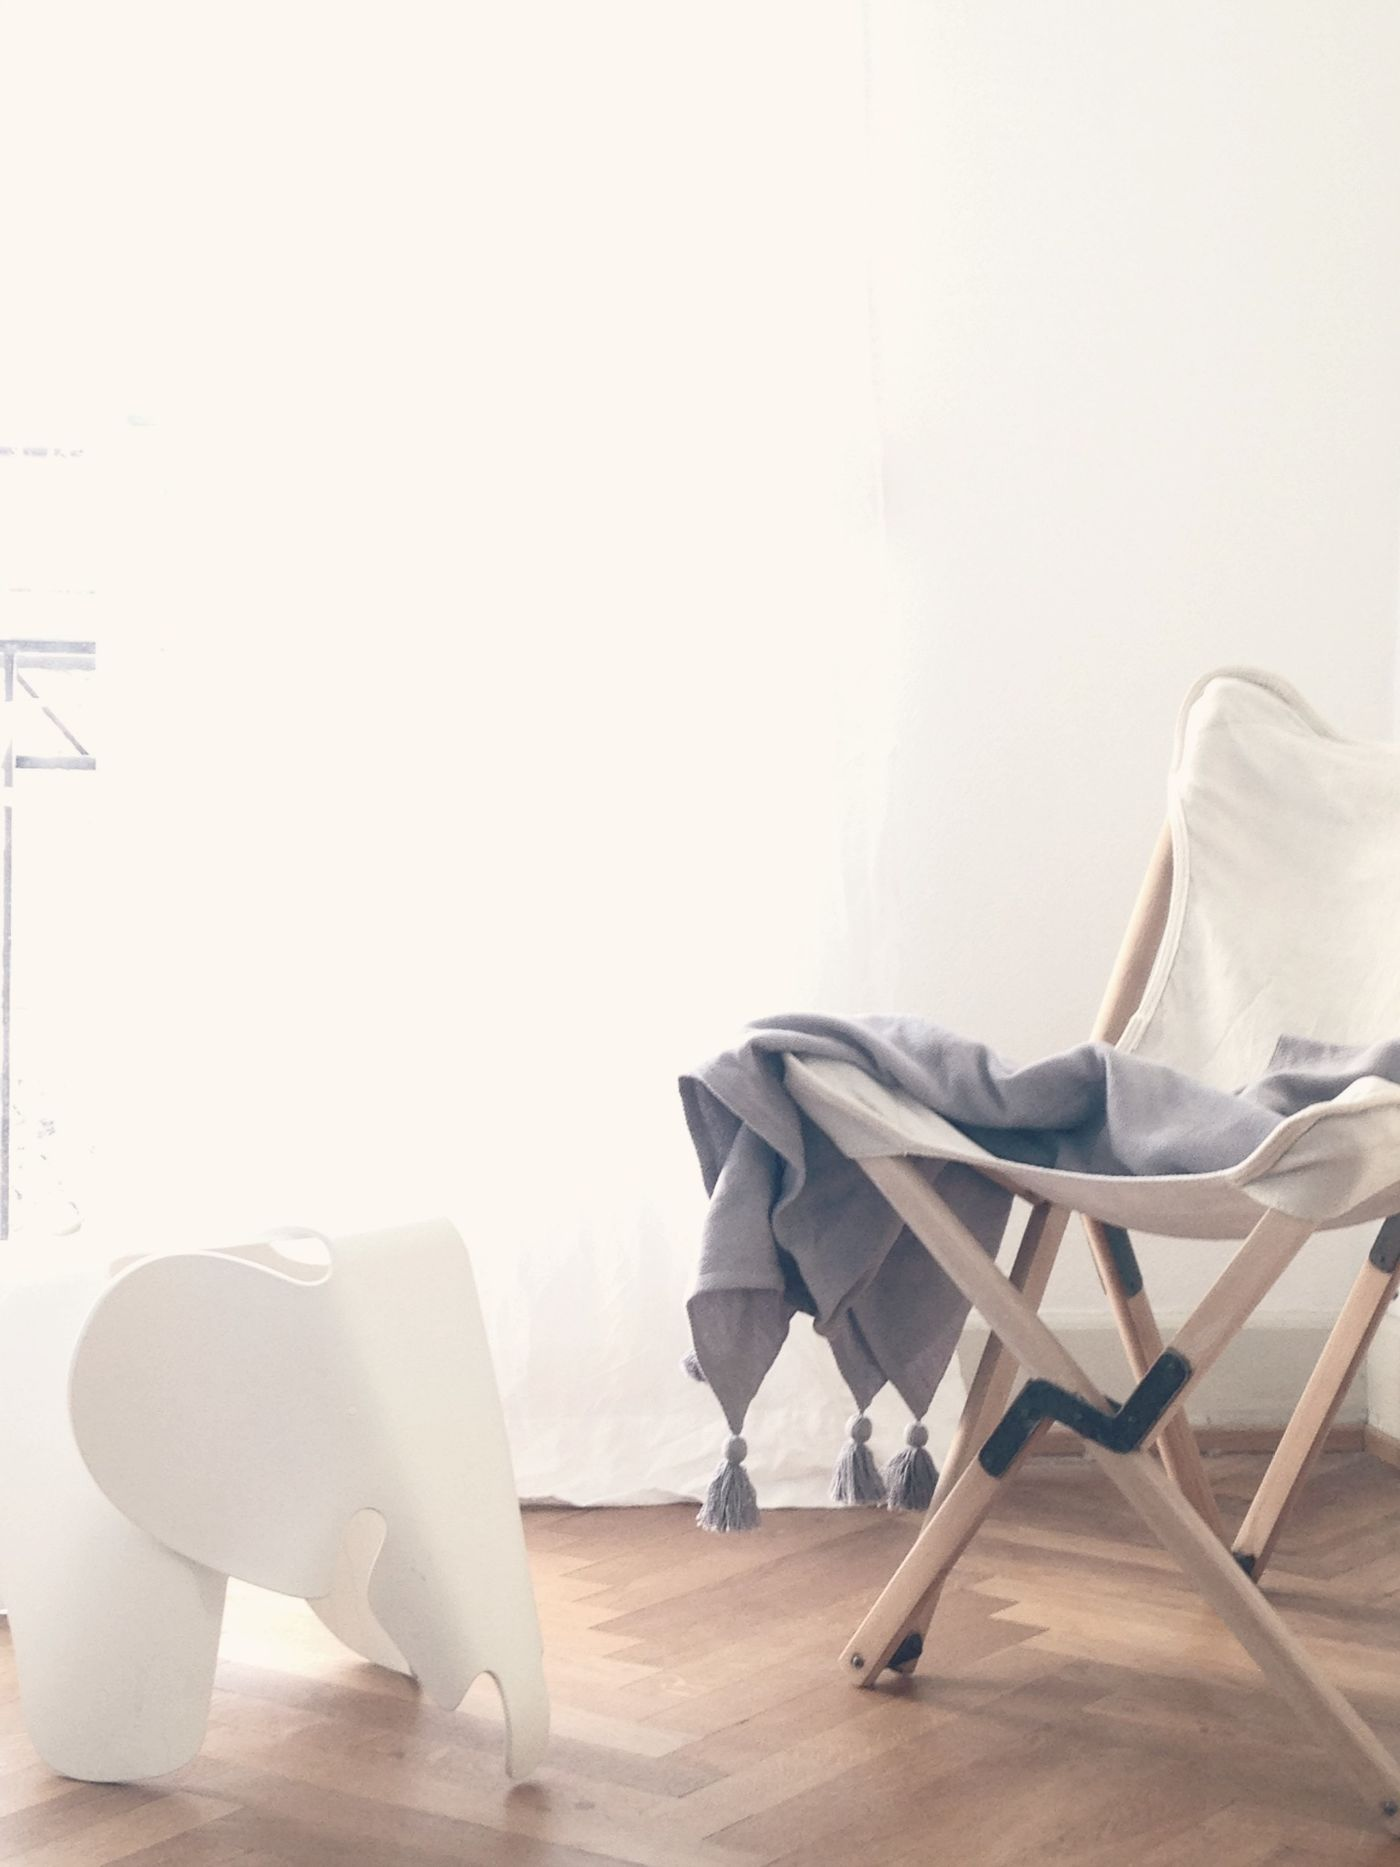 Vitra Elefant Cheap Eames Replica Elephant Kids Chair